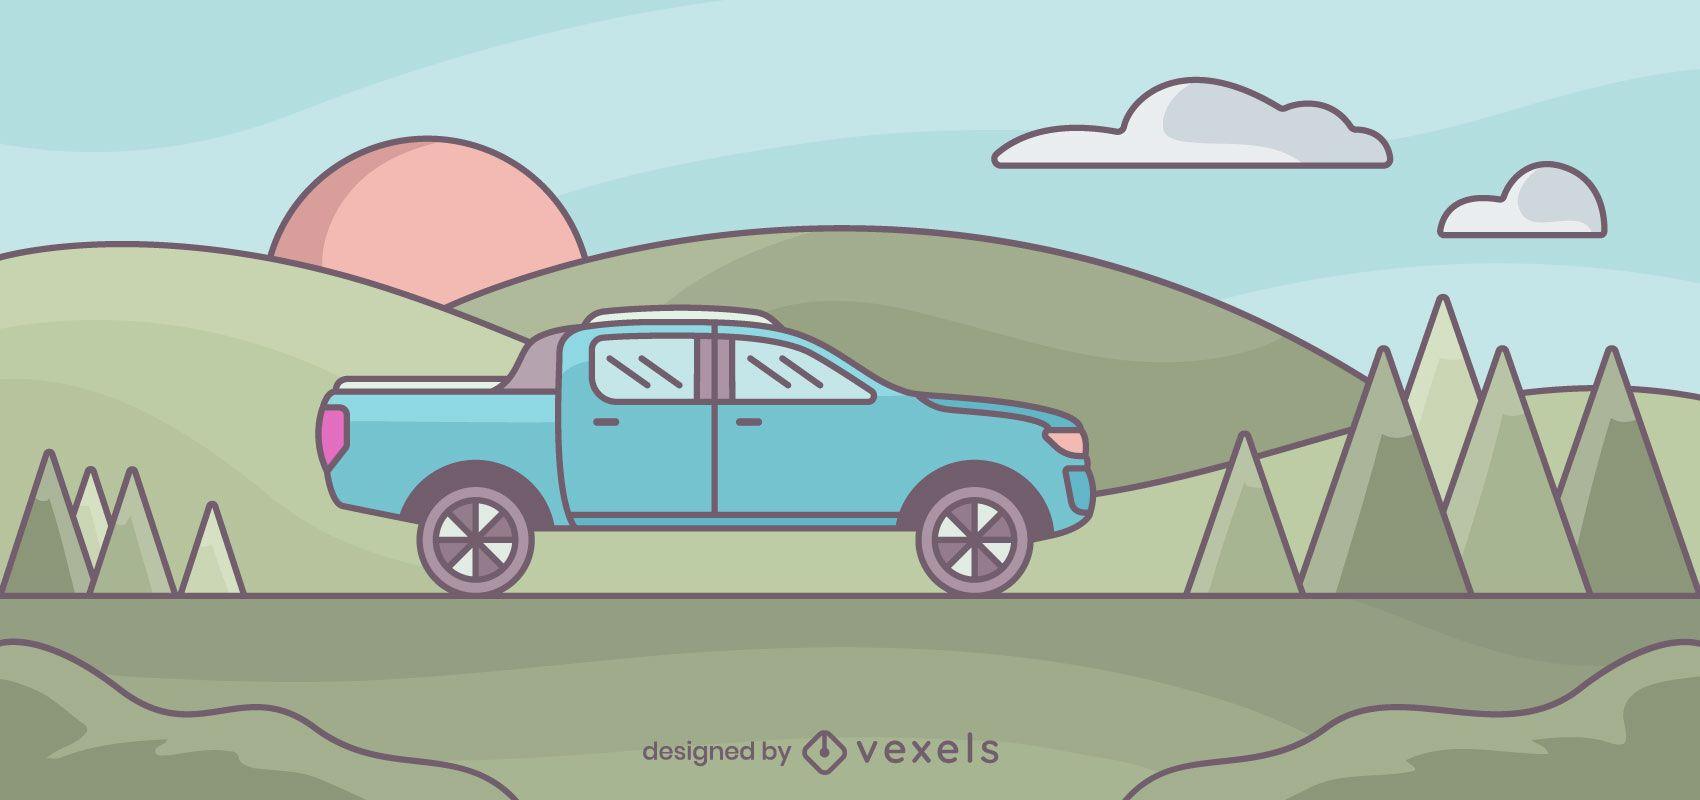 Pickup van scenery illustration